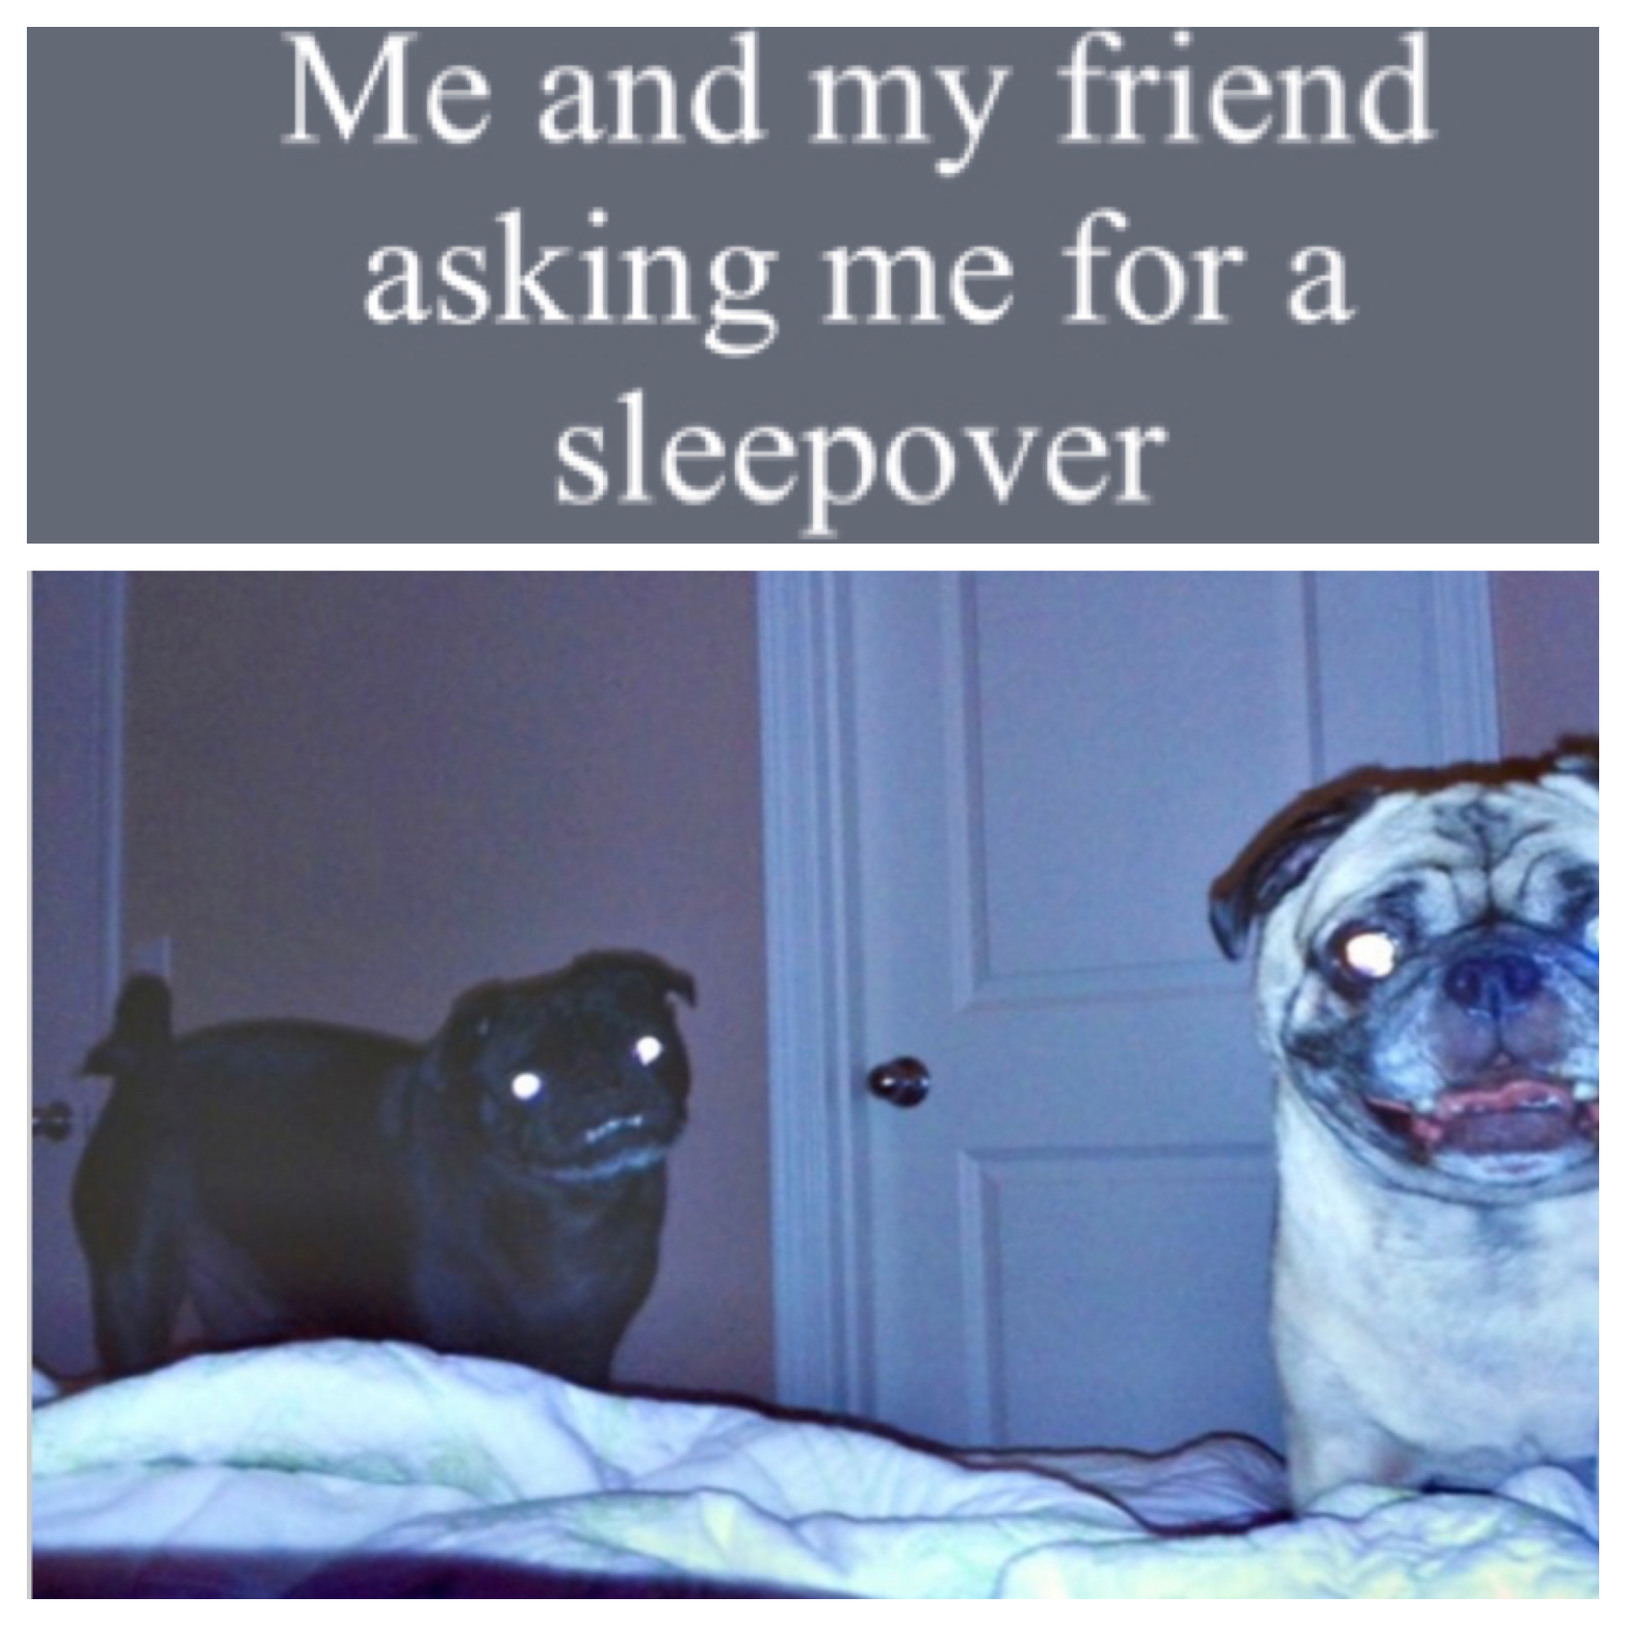 Be polite when asking for a sleepover - meme